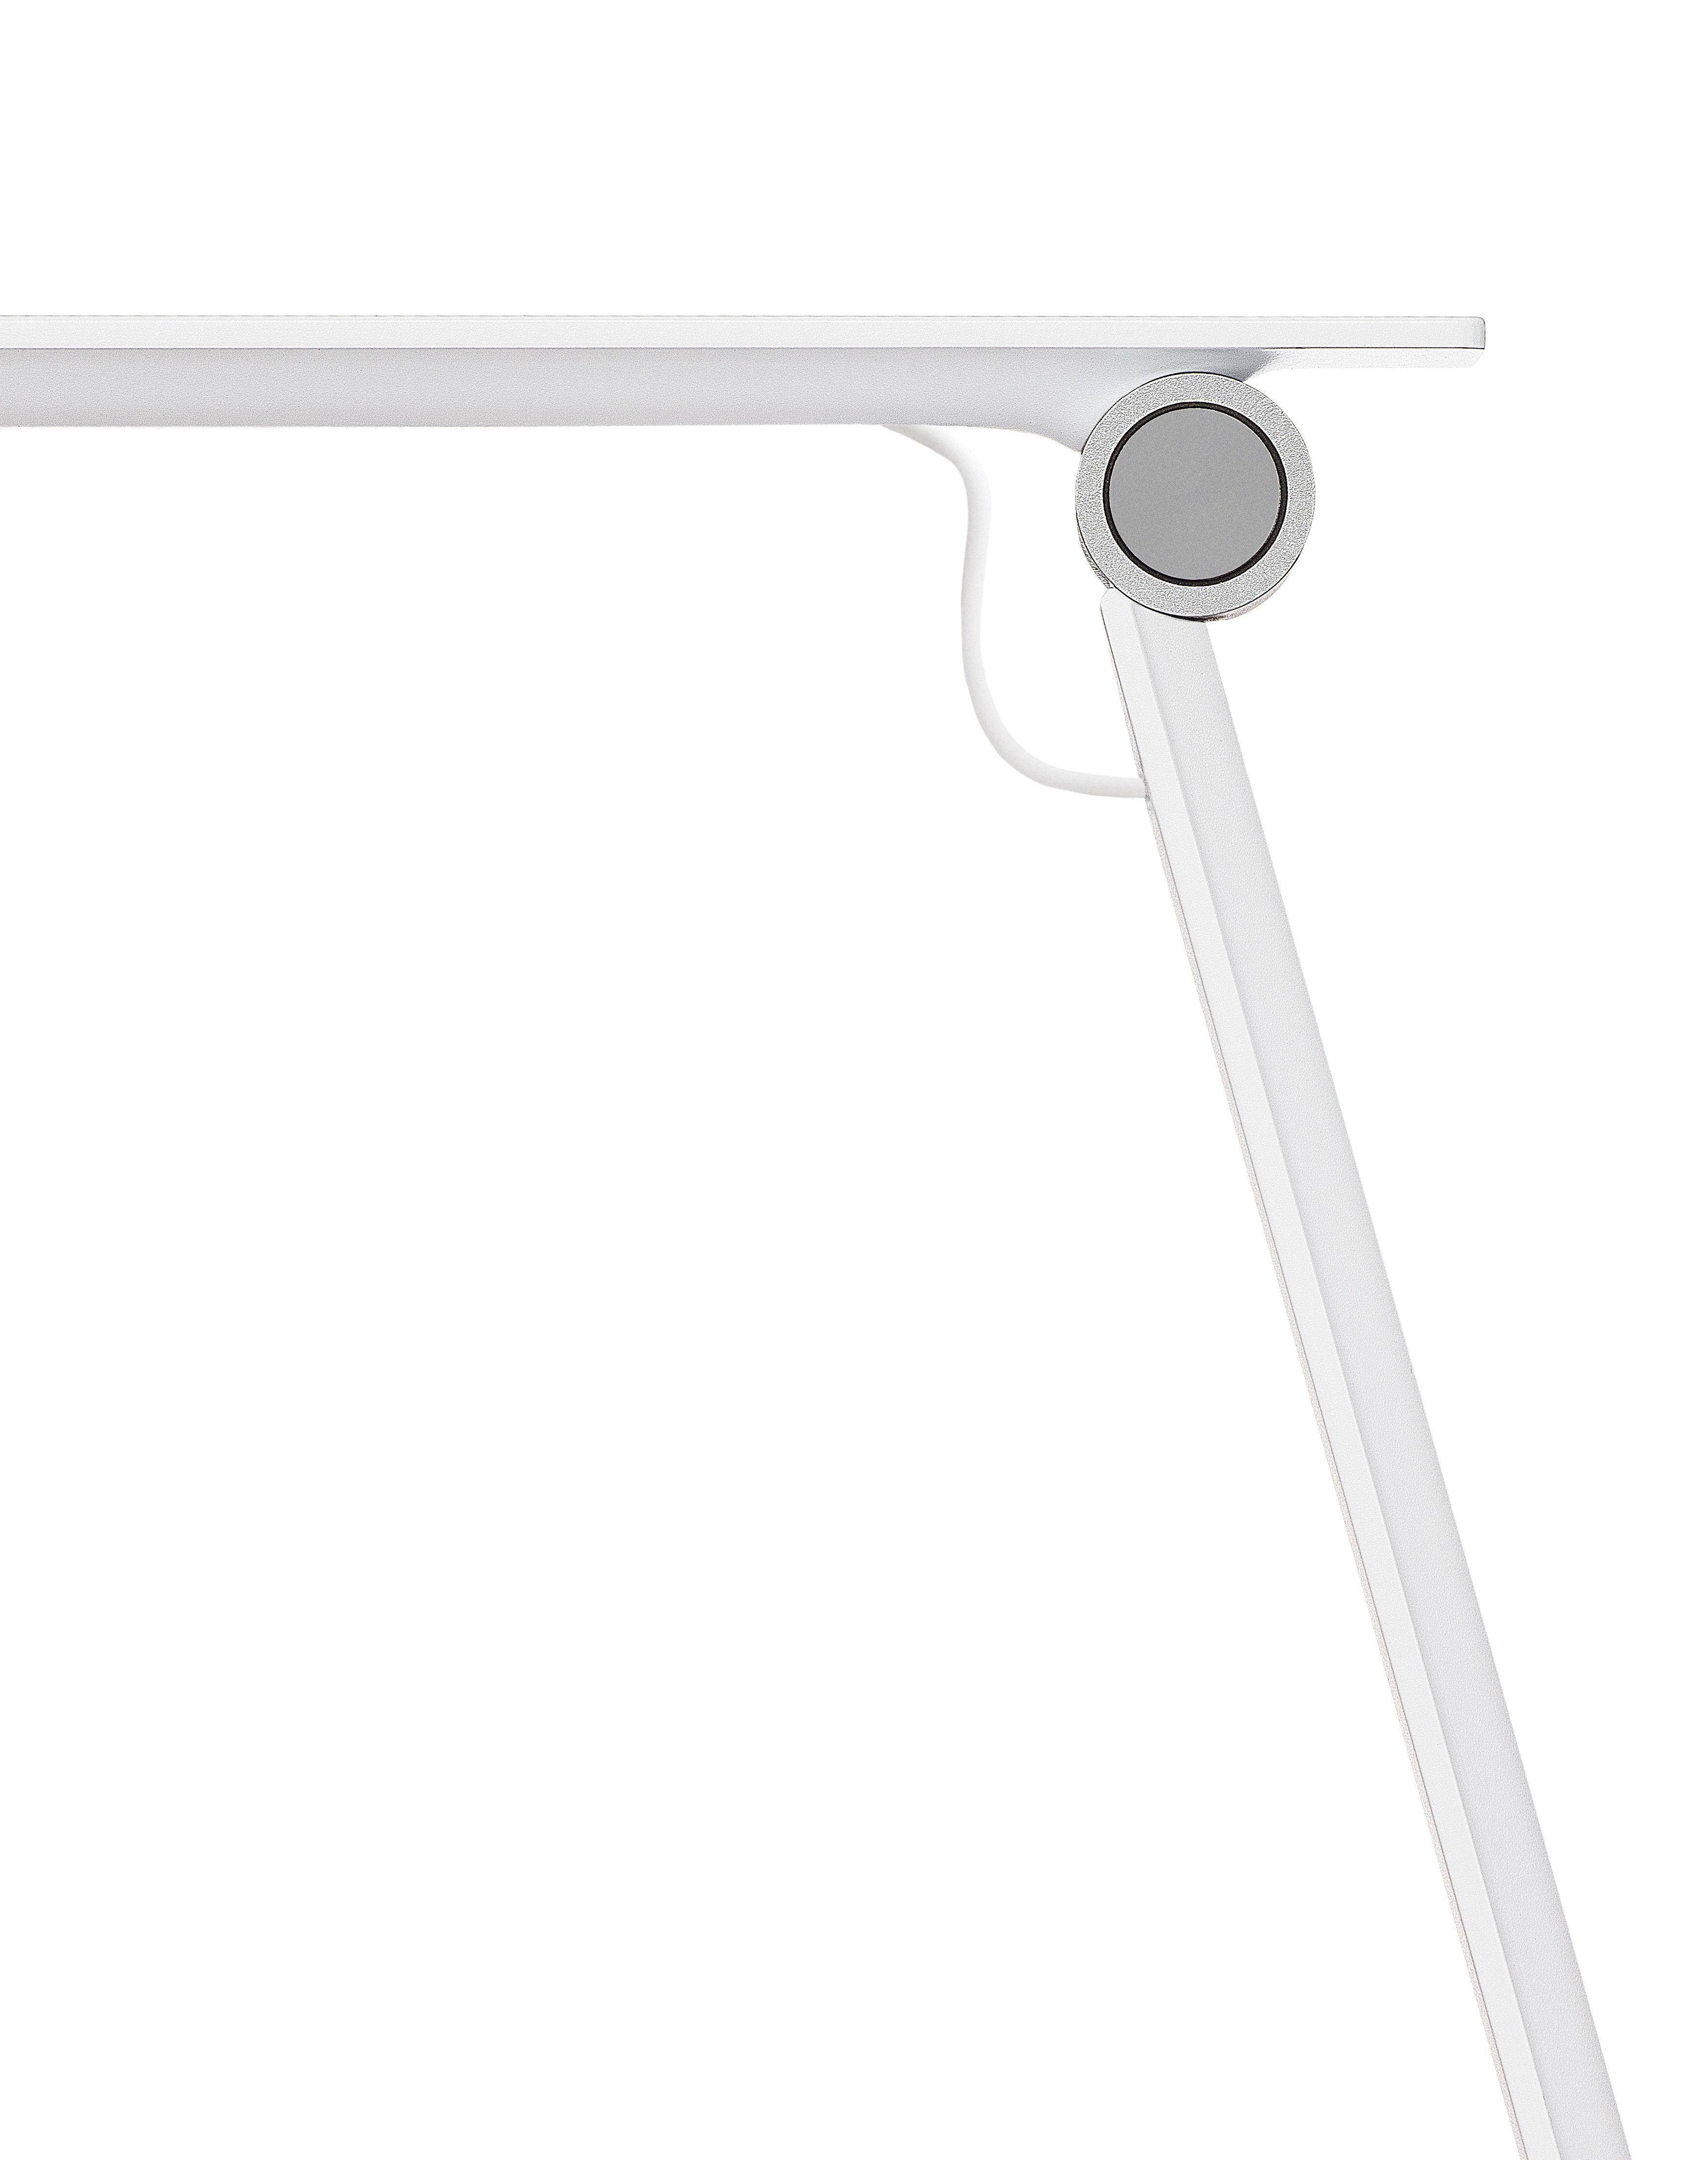 lampe de table njp led bras articul blanc eclairage. Black Bedroom Furniture Sets. Home Design Ideas